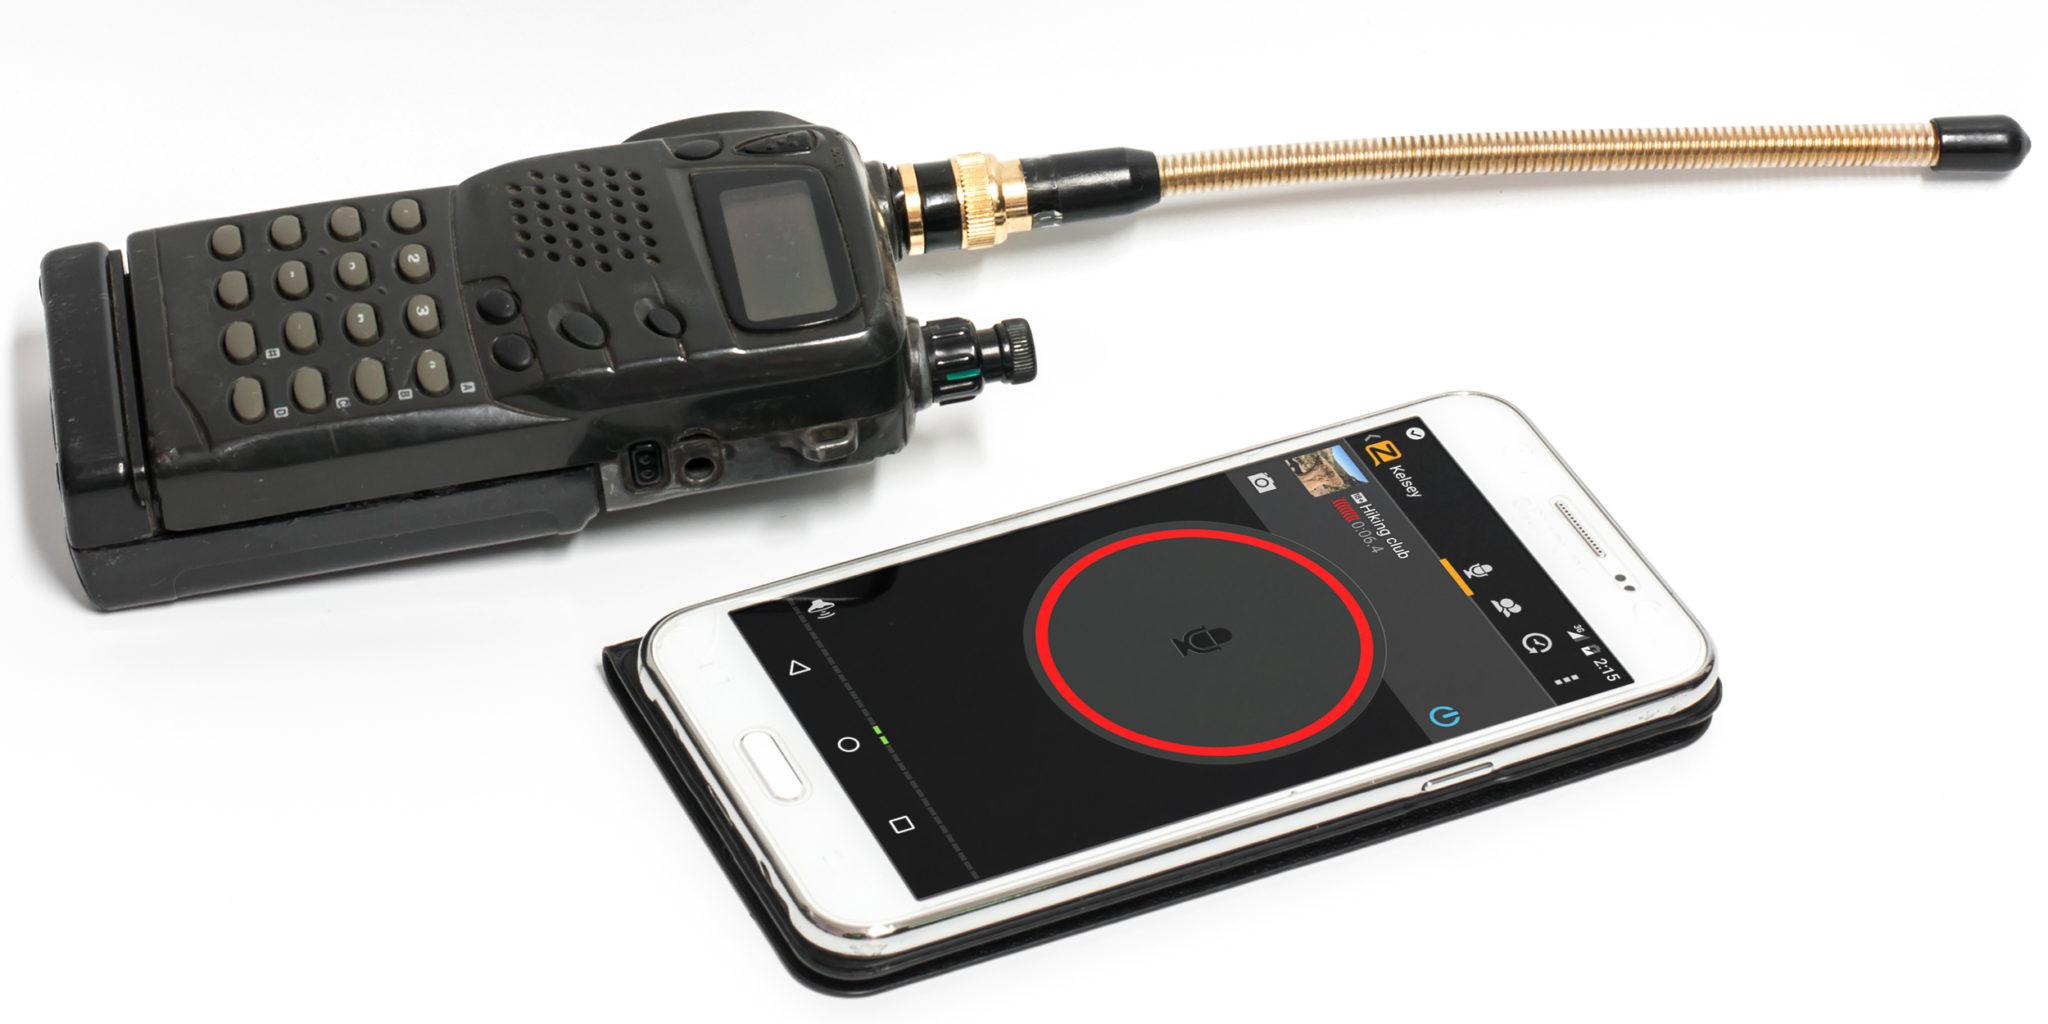 the best free walkie